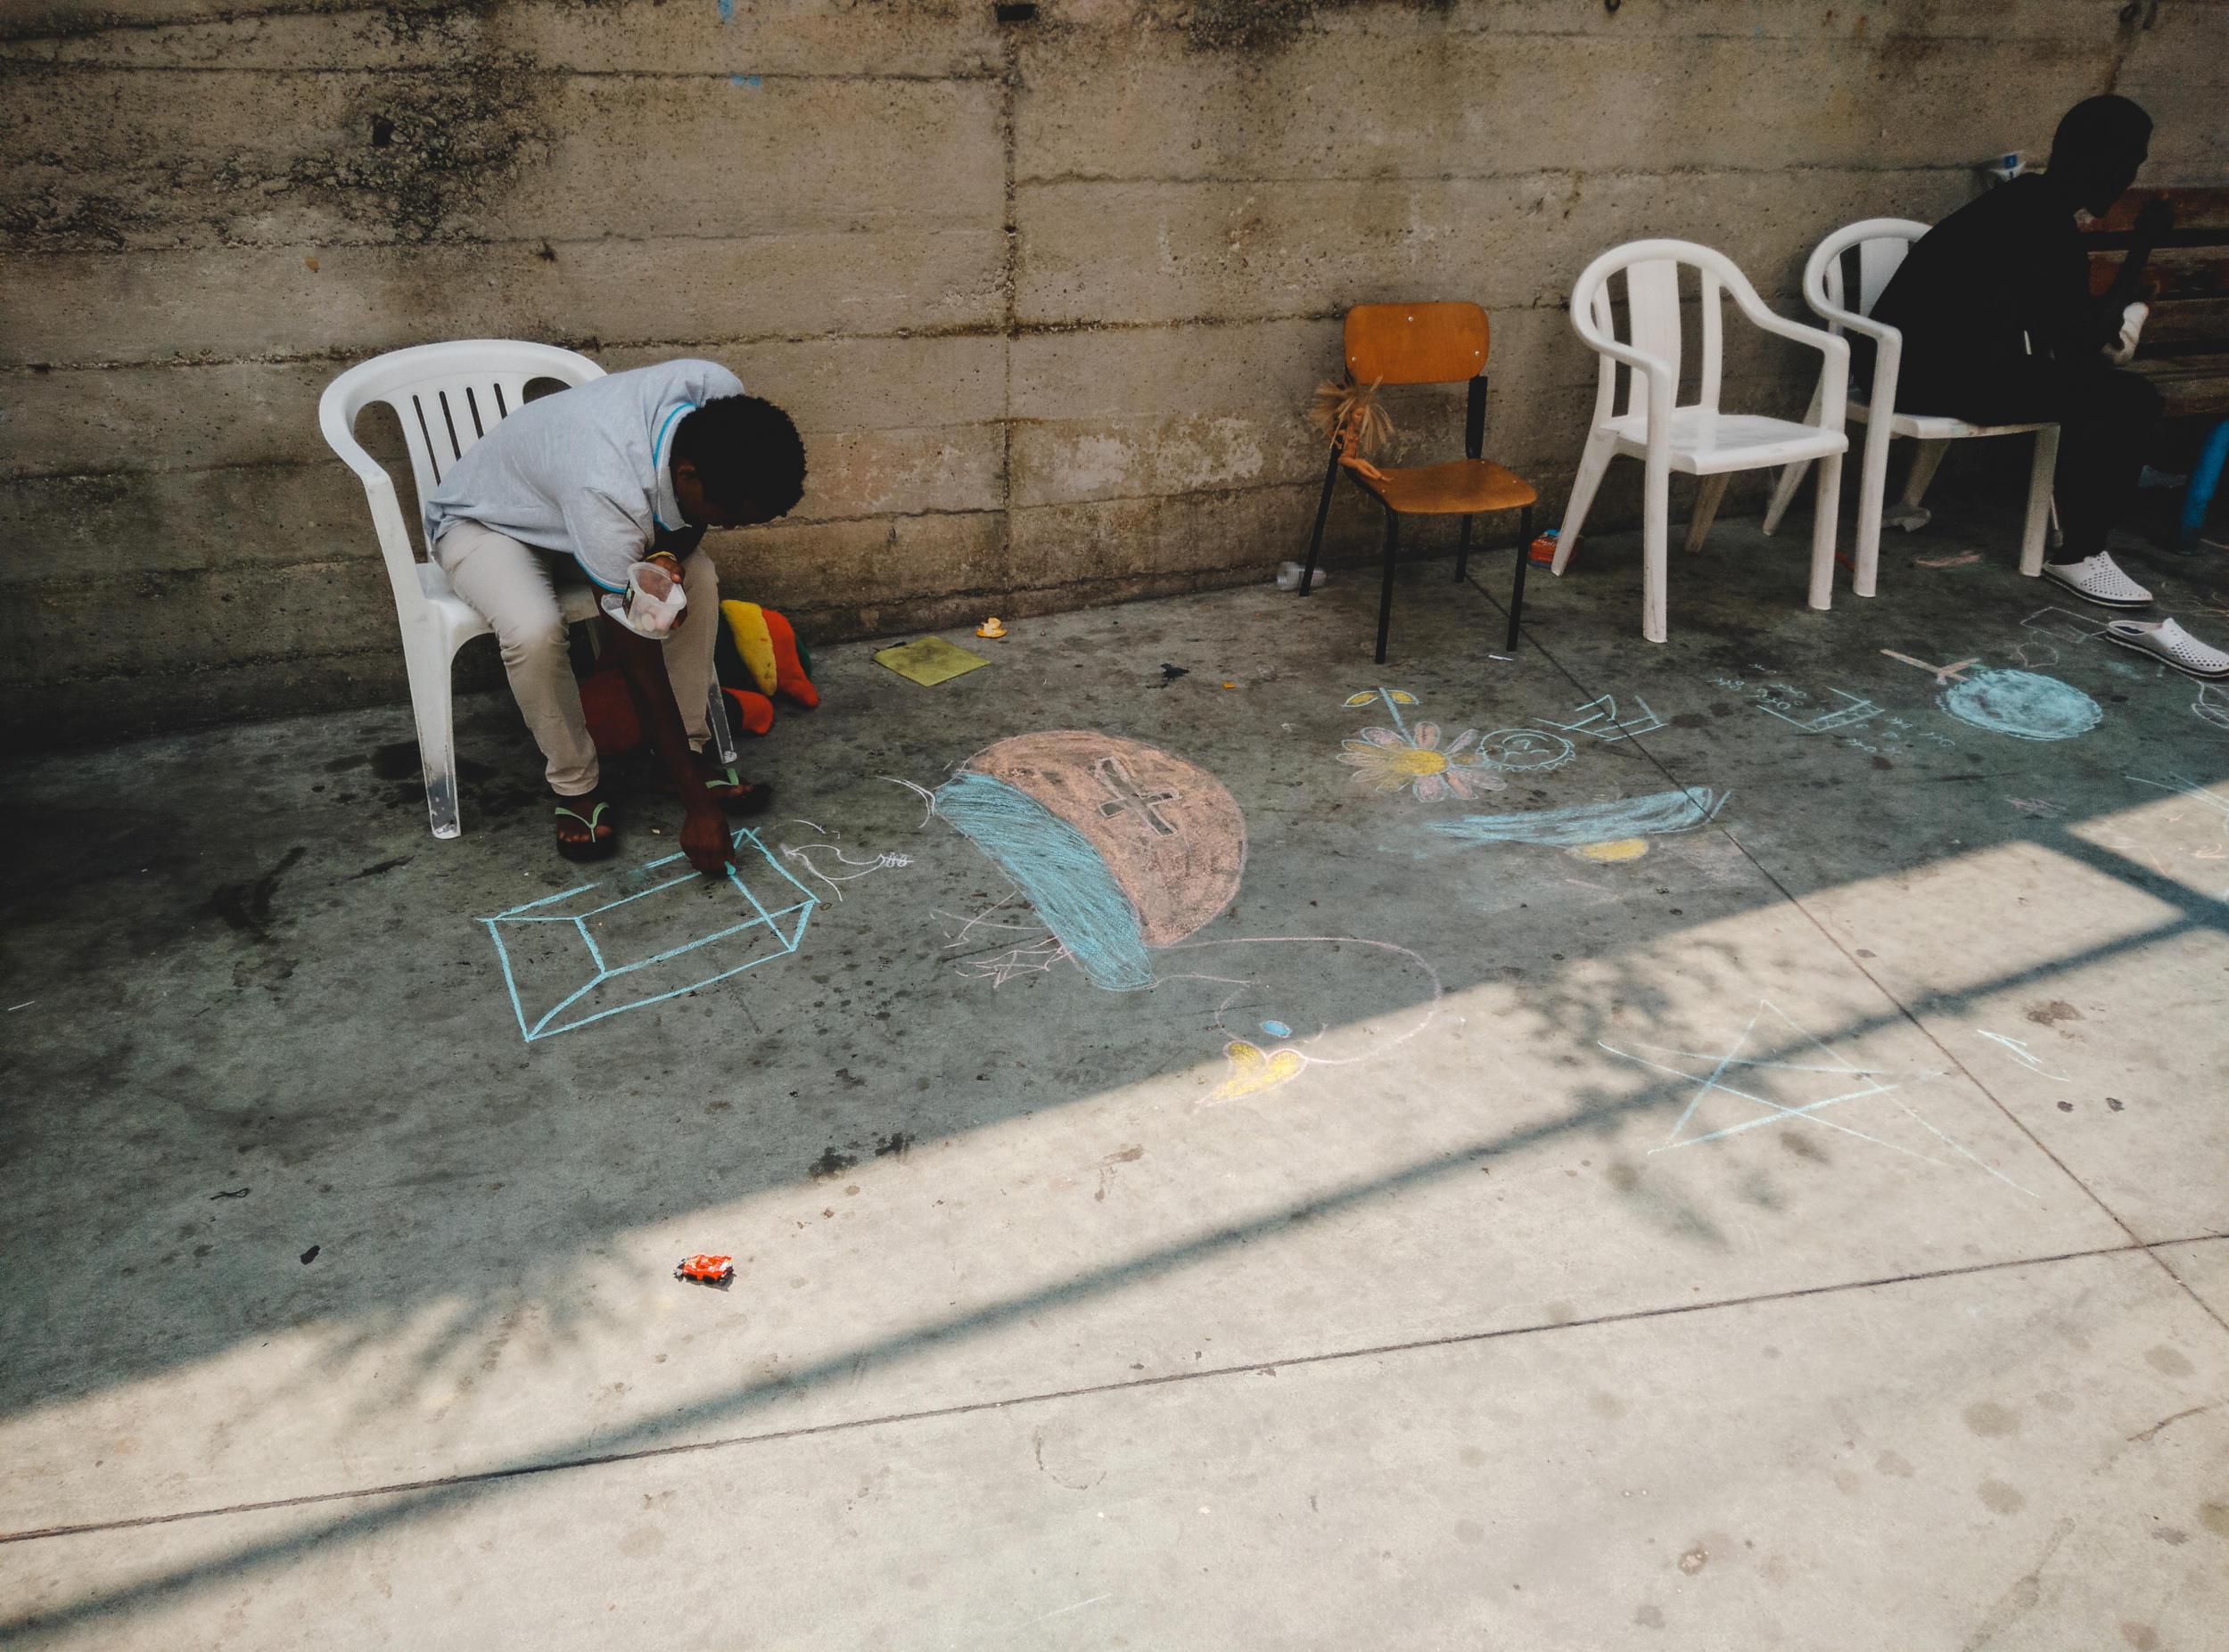 un migrante disegna a terra con un gesso